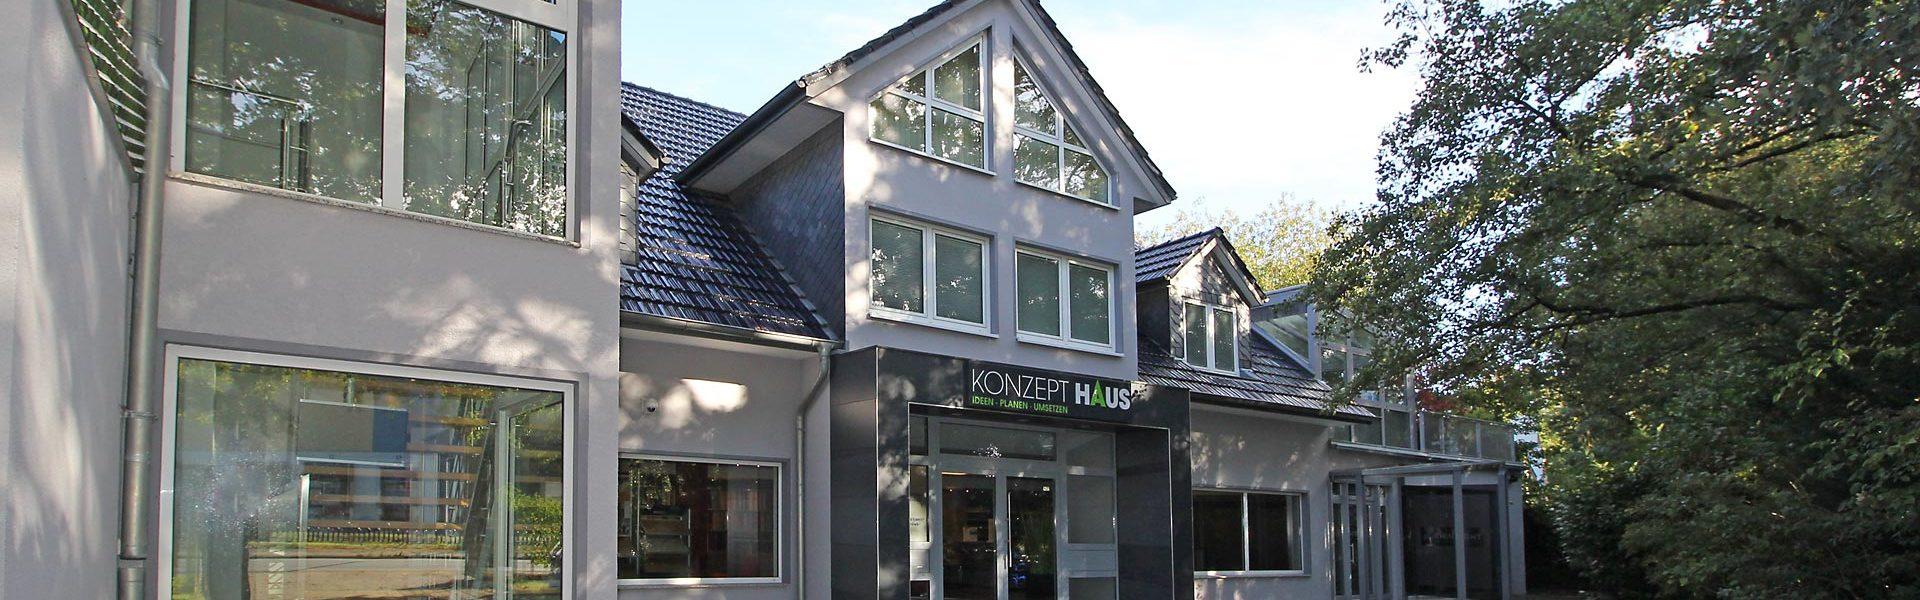 Konzepthaus Becker Delmenhorst 03